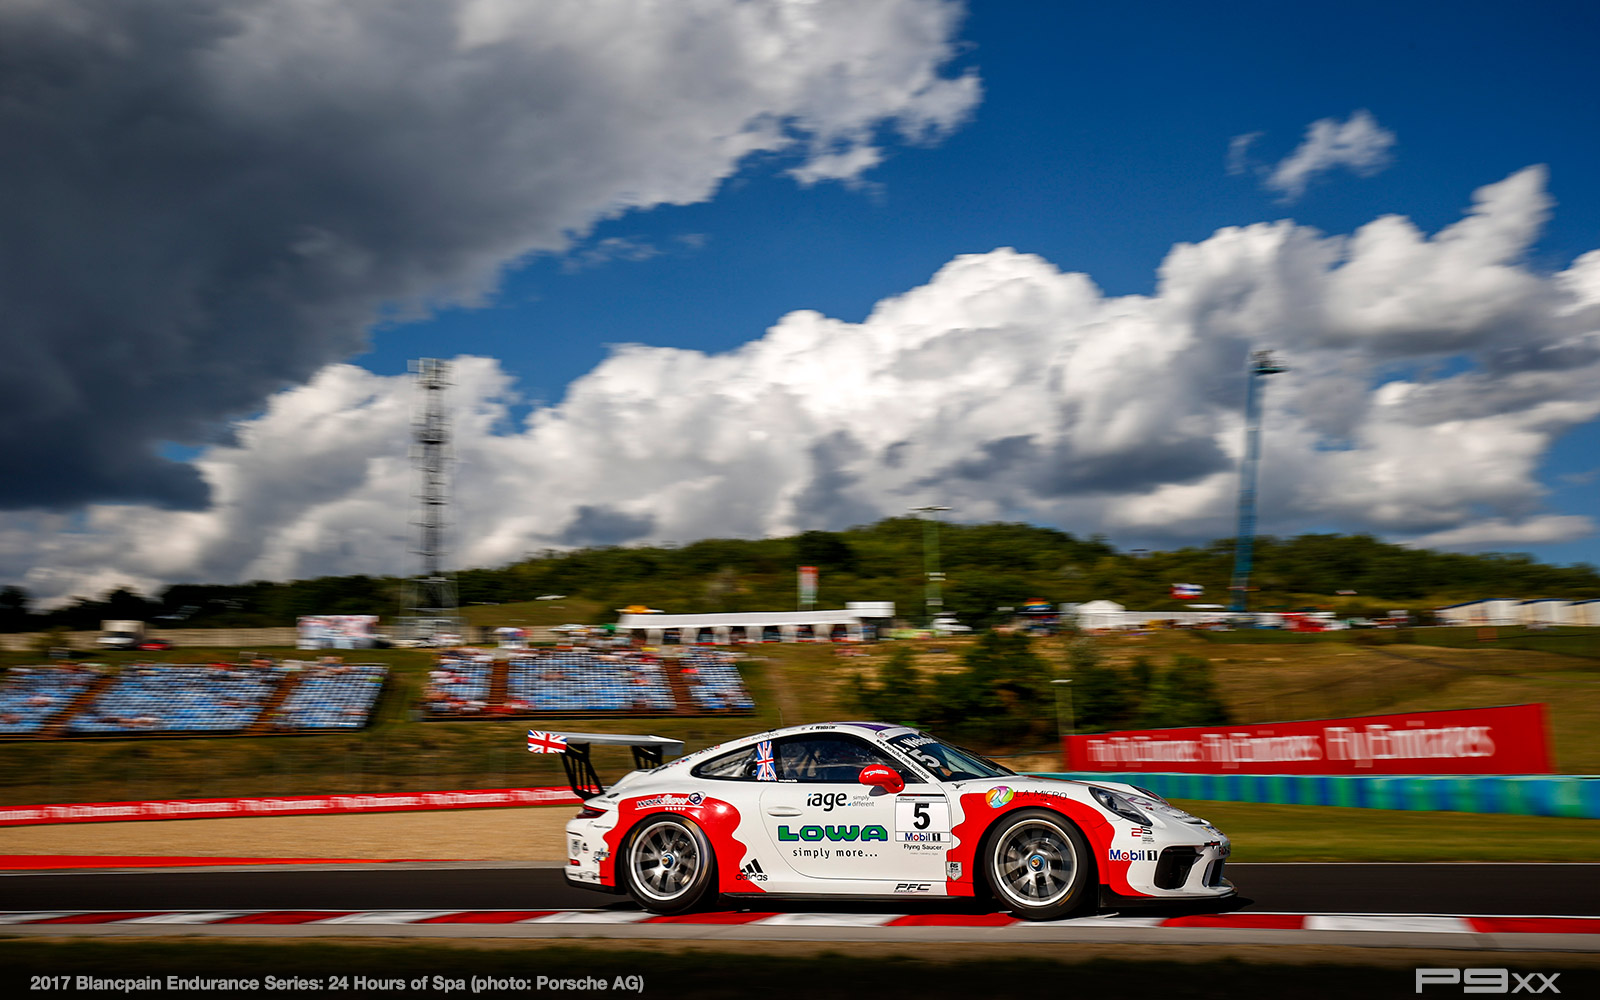 2017-24-Hours-of-Spa-Porsche-335